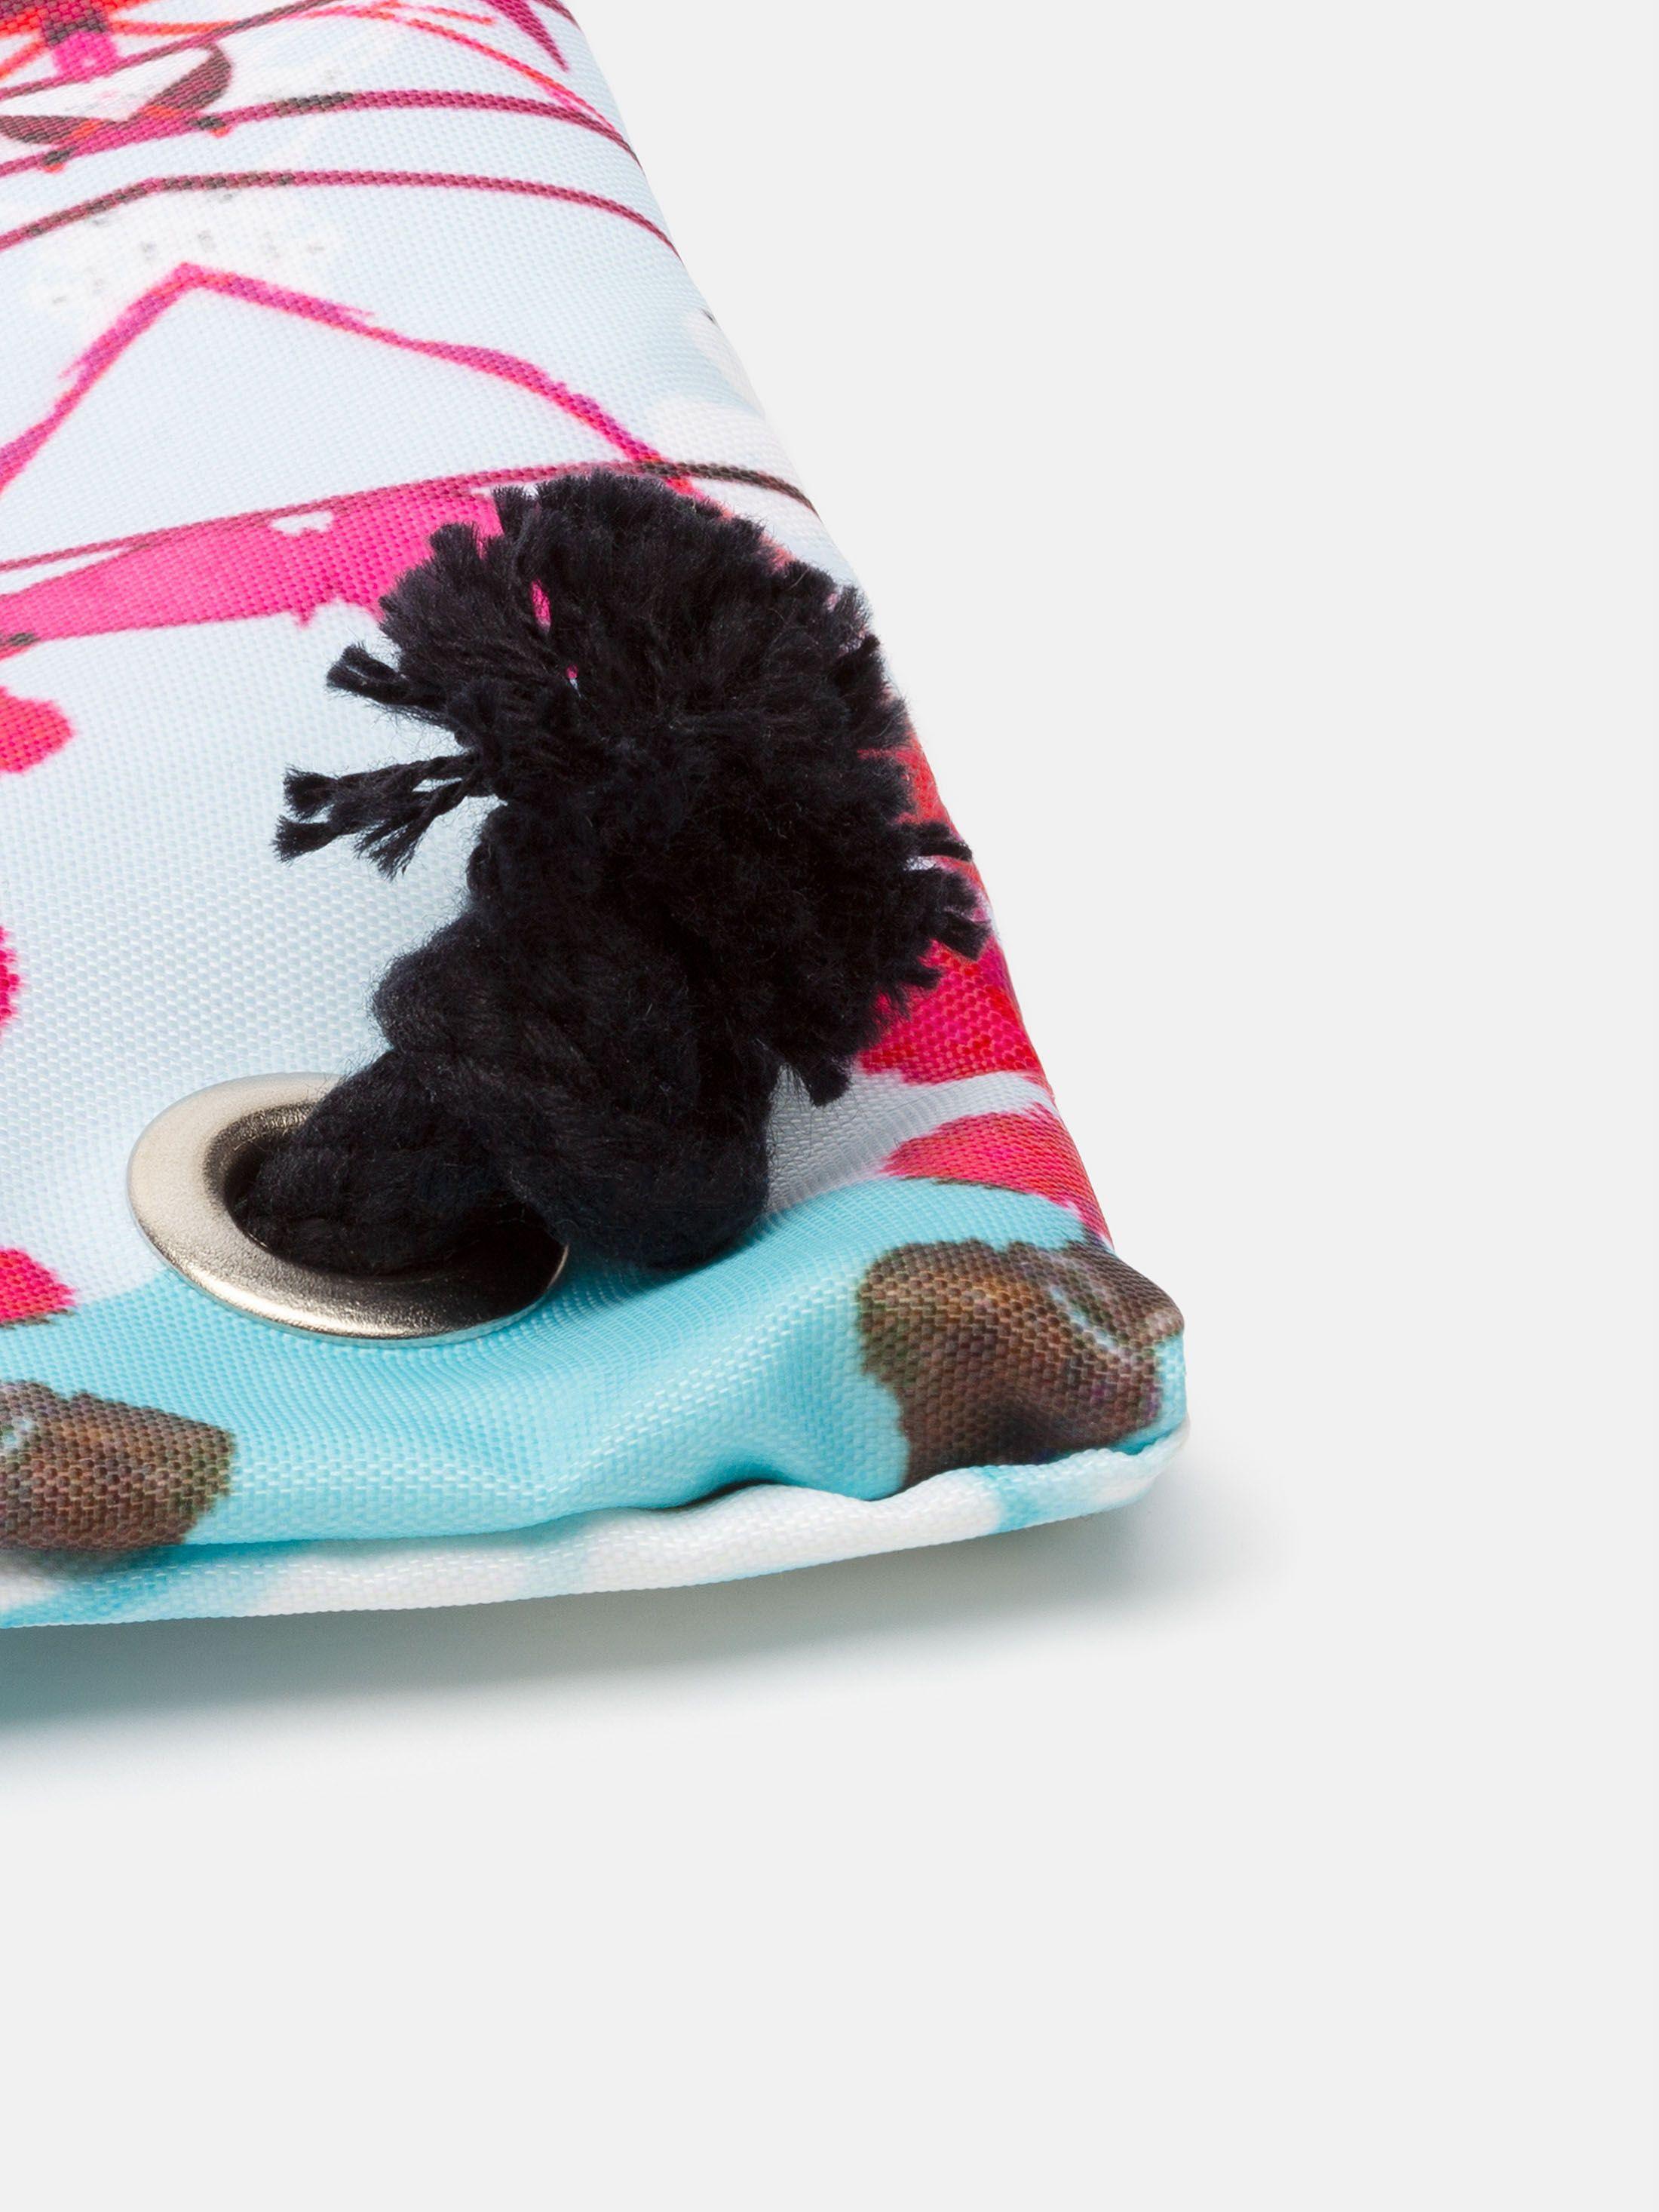 kids swim bags uk made